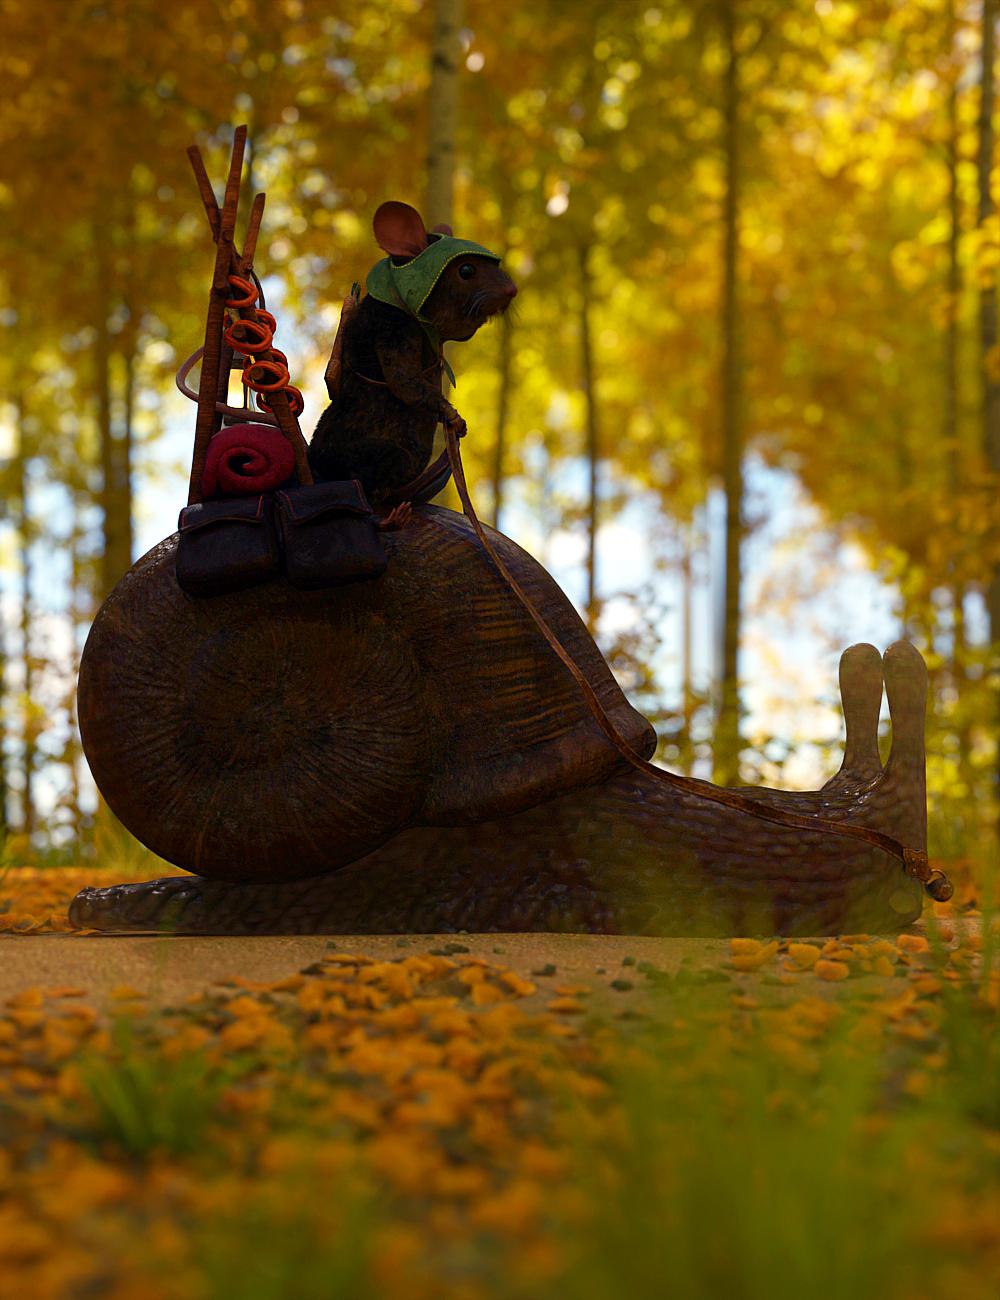 Riding Snail by: JoeQuick, 3D Models by Daz 3D